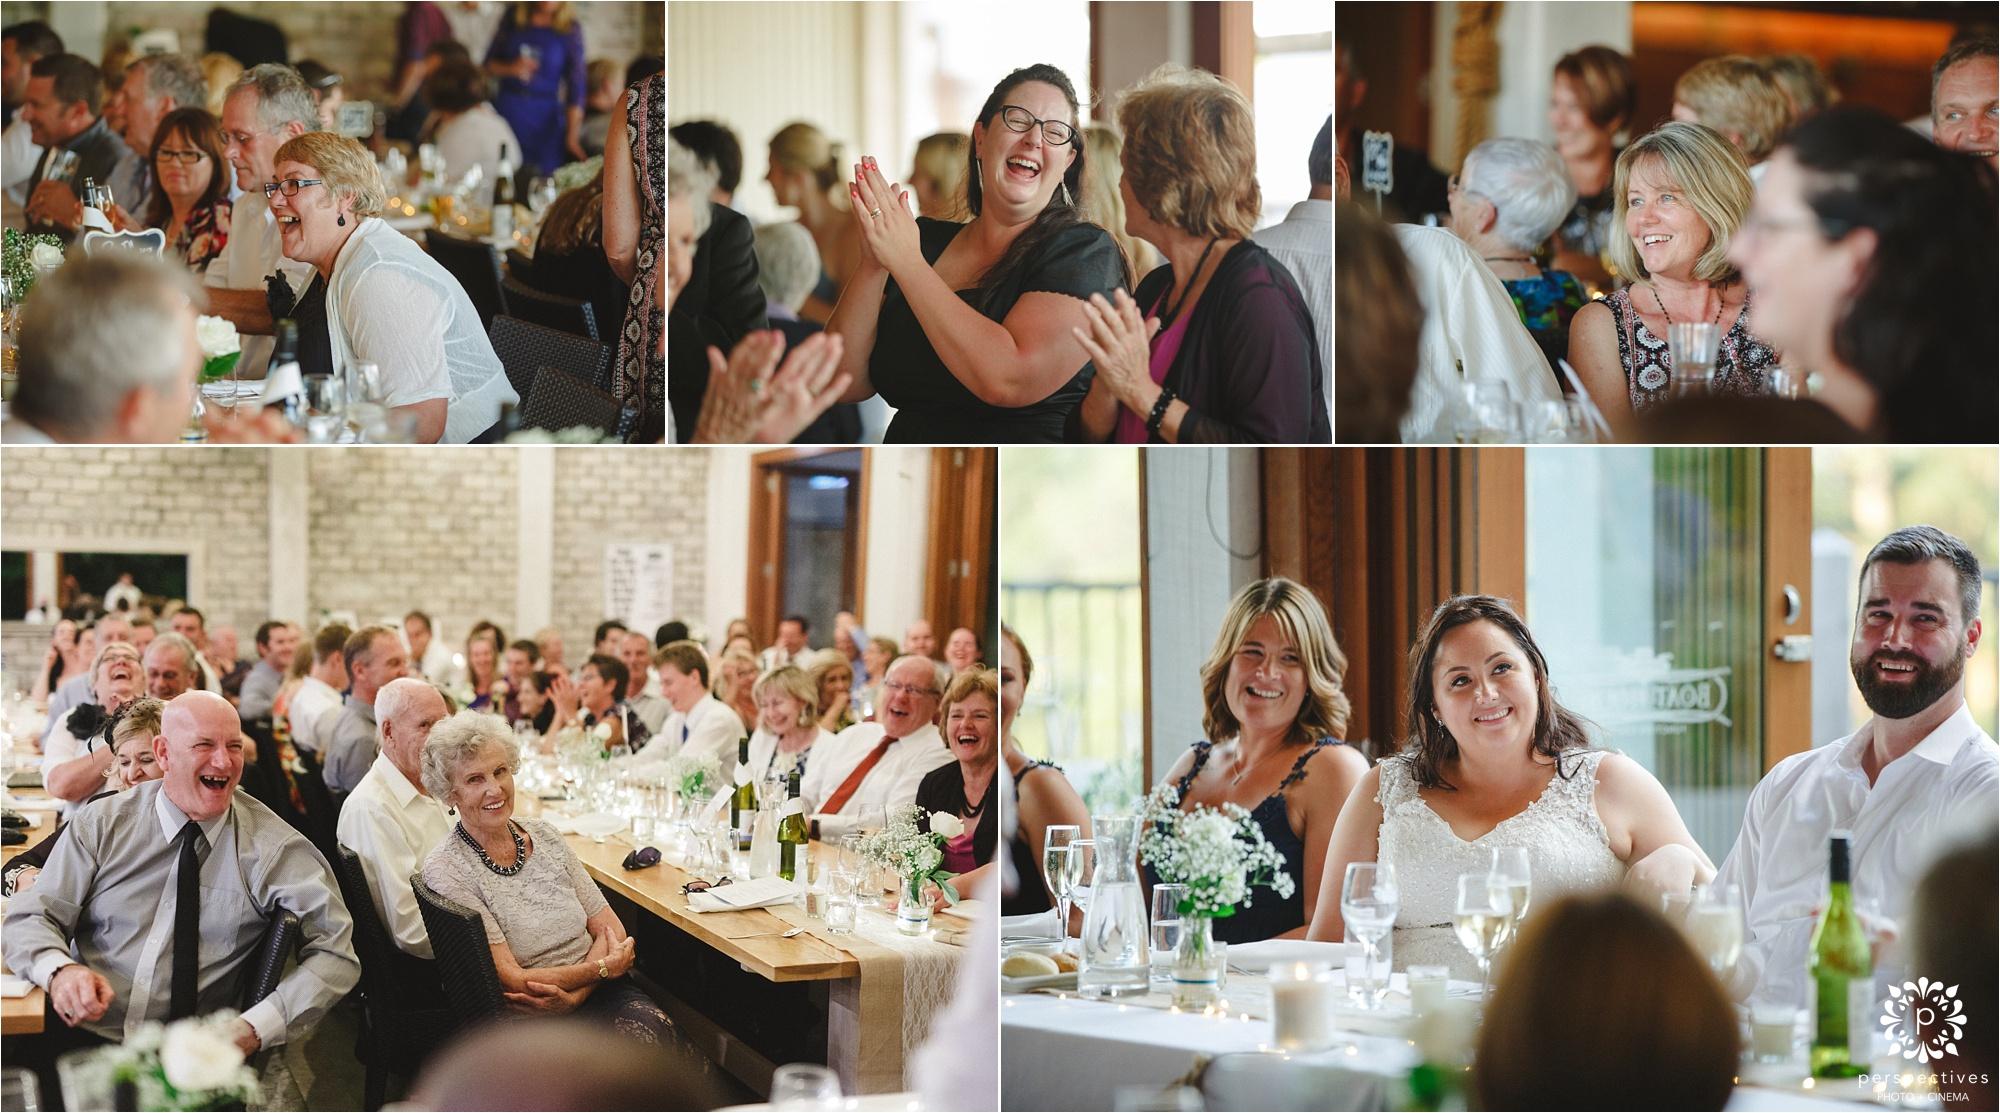 Boatshed Riverhead wedding photos